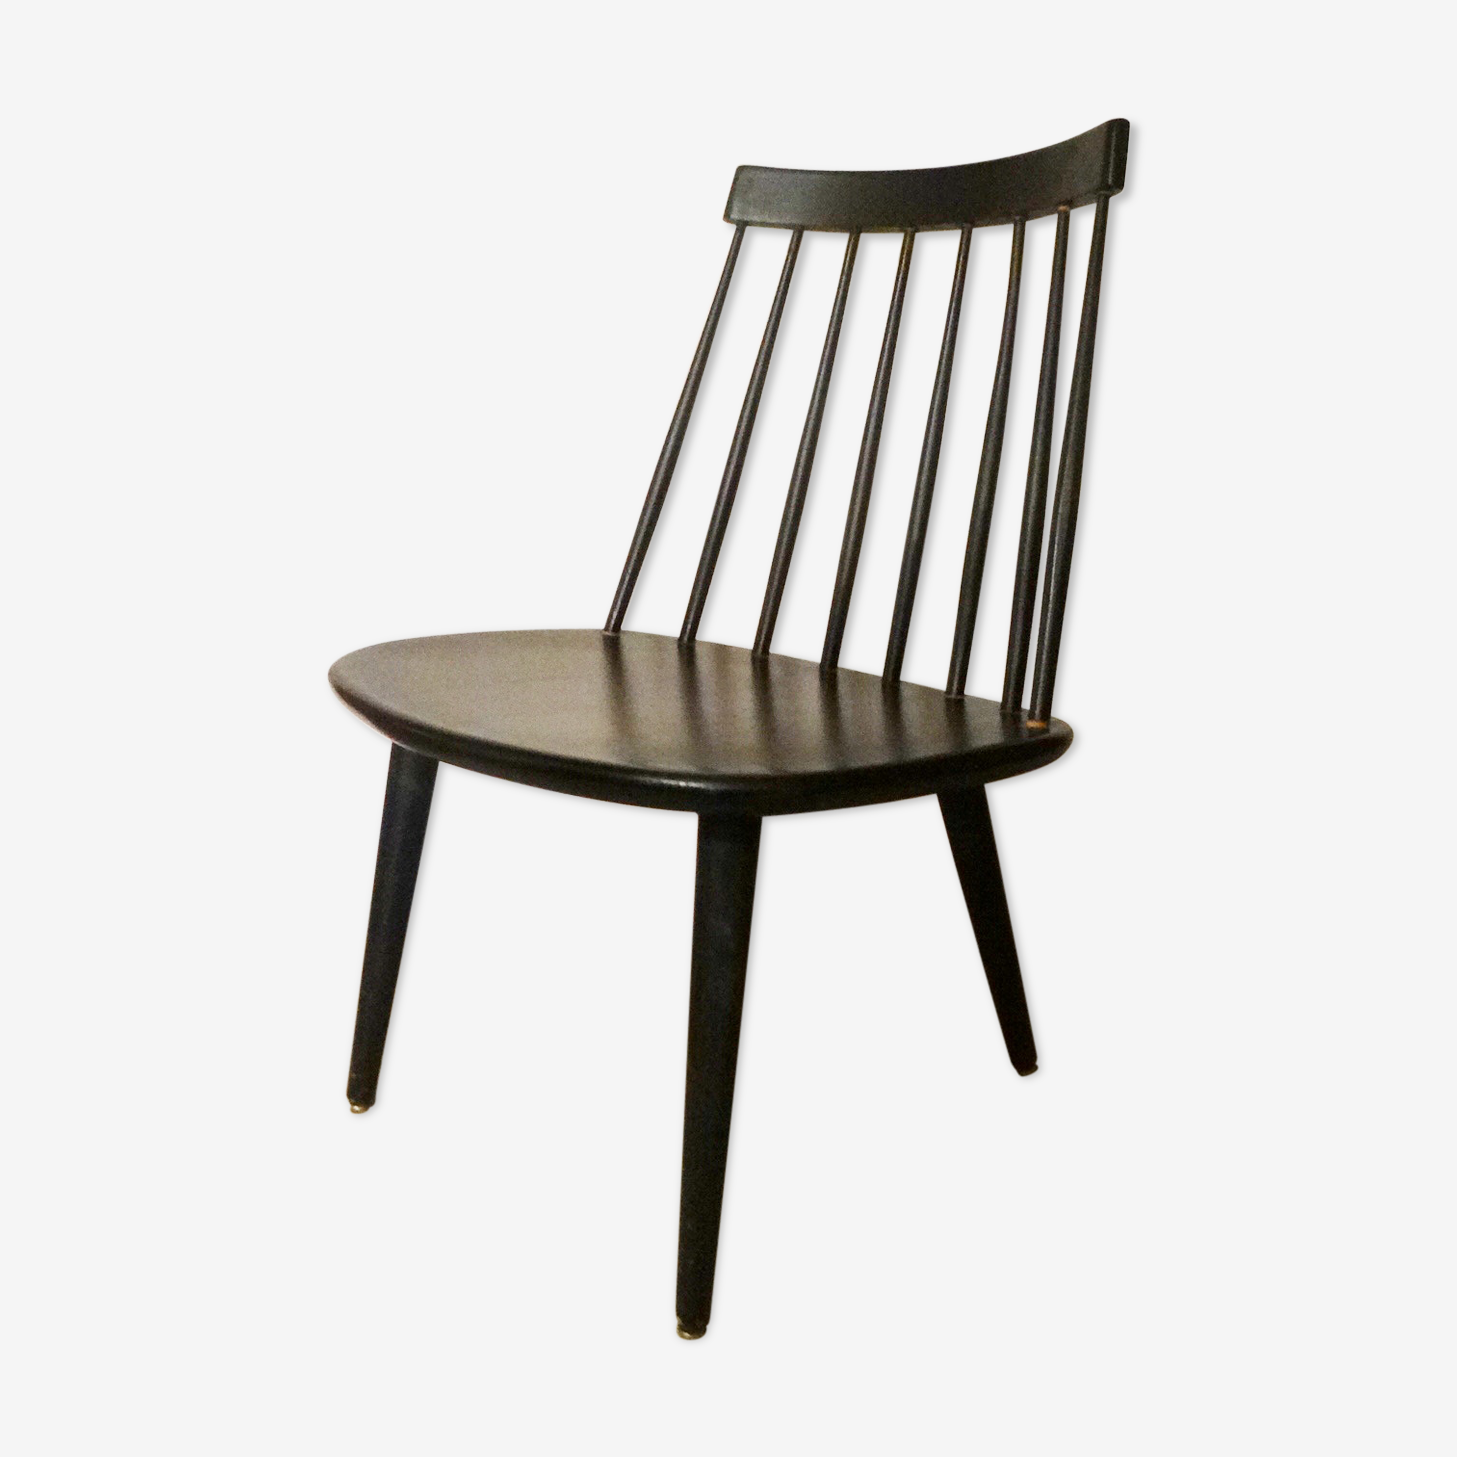 Chaise design 60